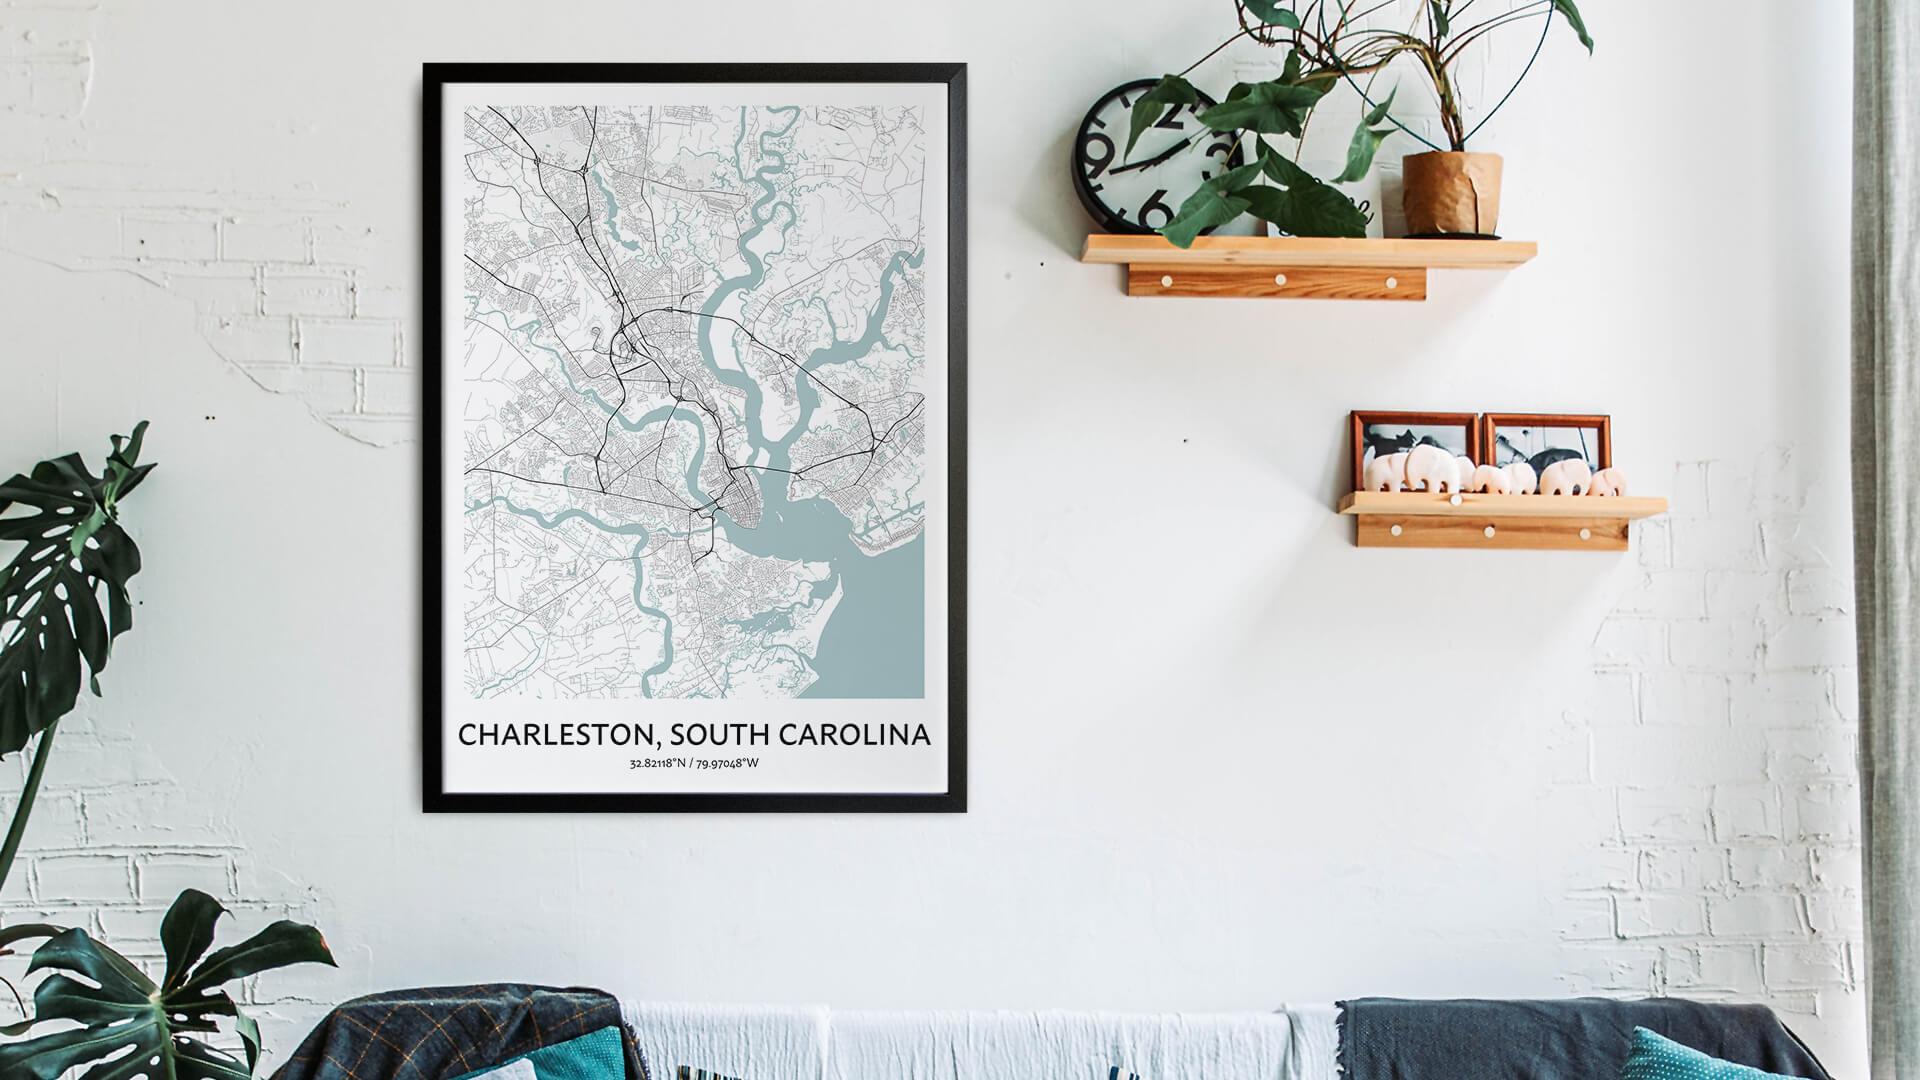 Charleston South Carolina map art